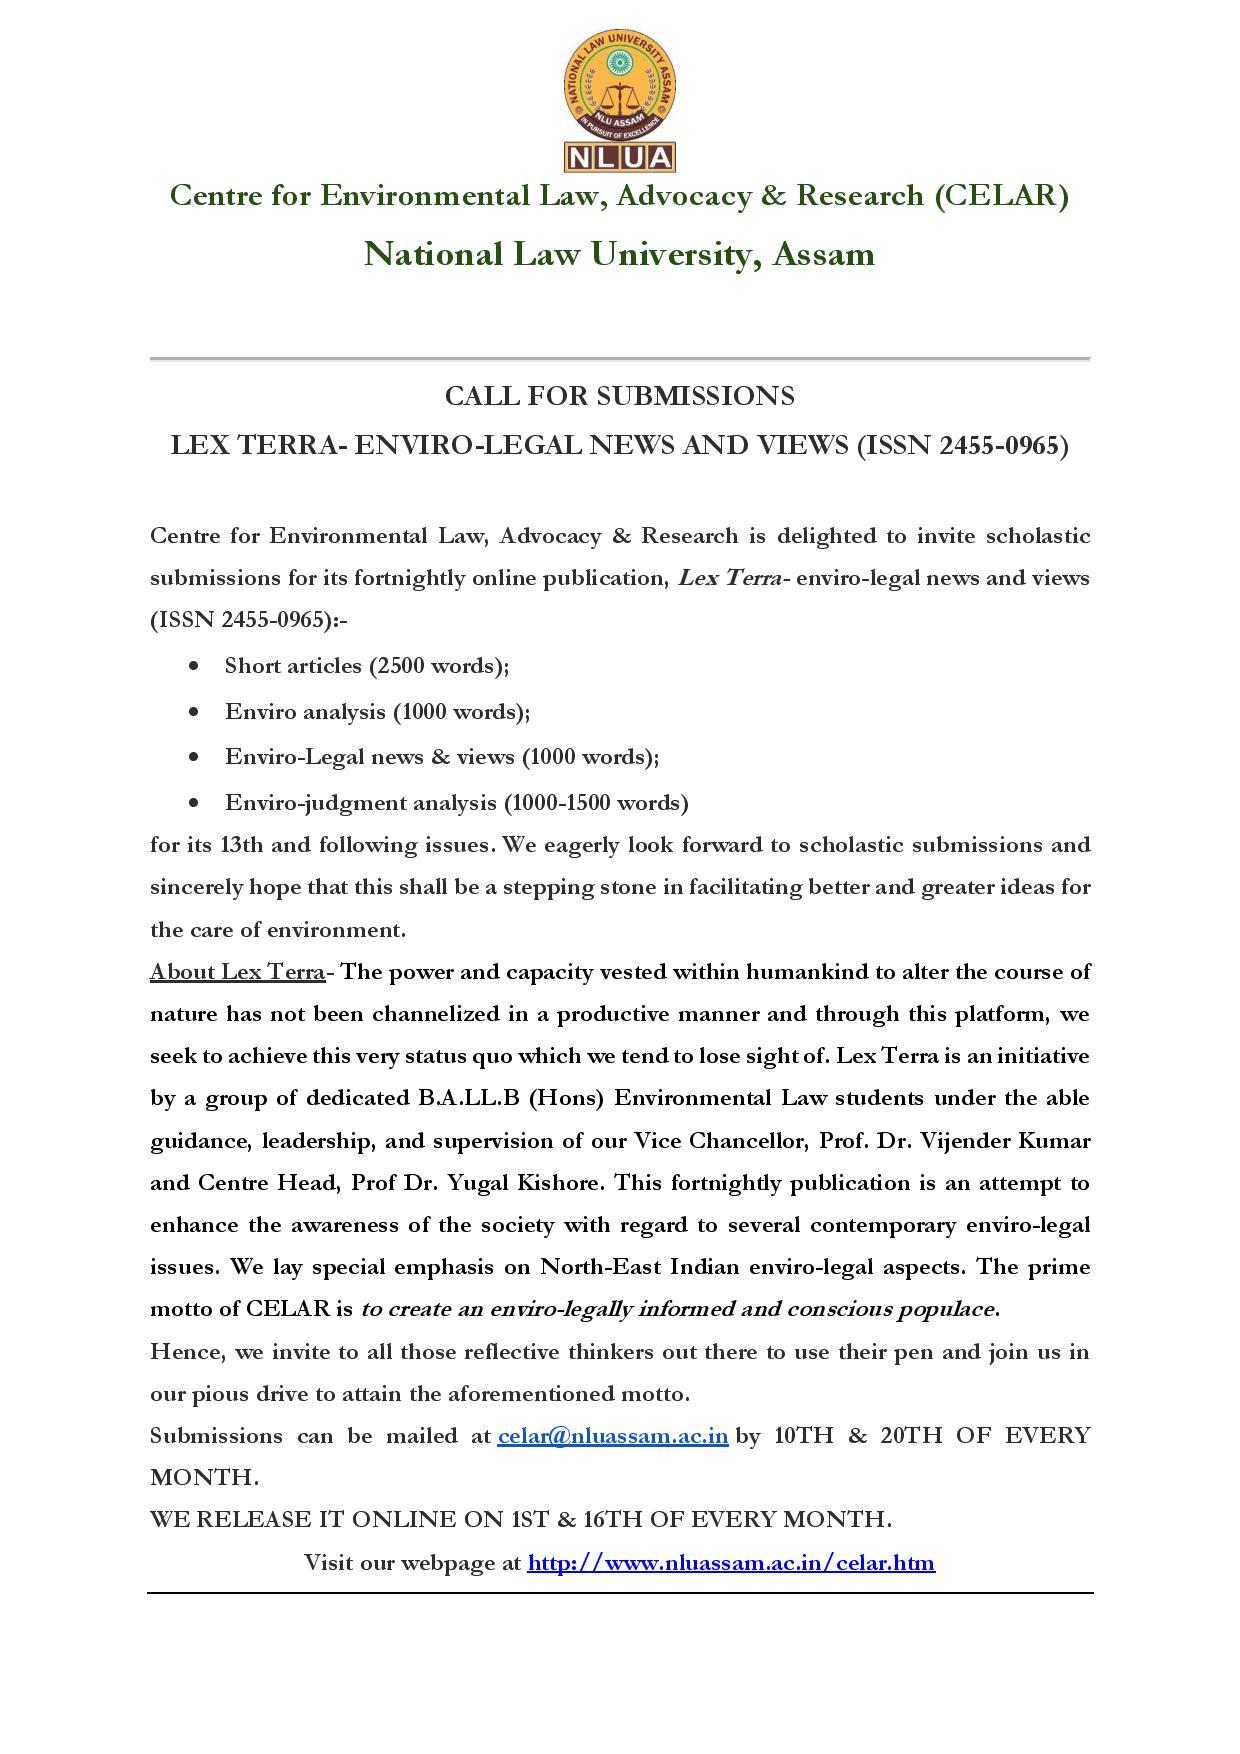 Call for Papers: NLU Assam's Lex Terra [Enviro-Legal News and Views]